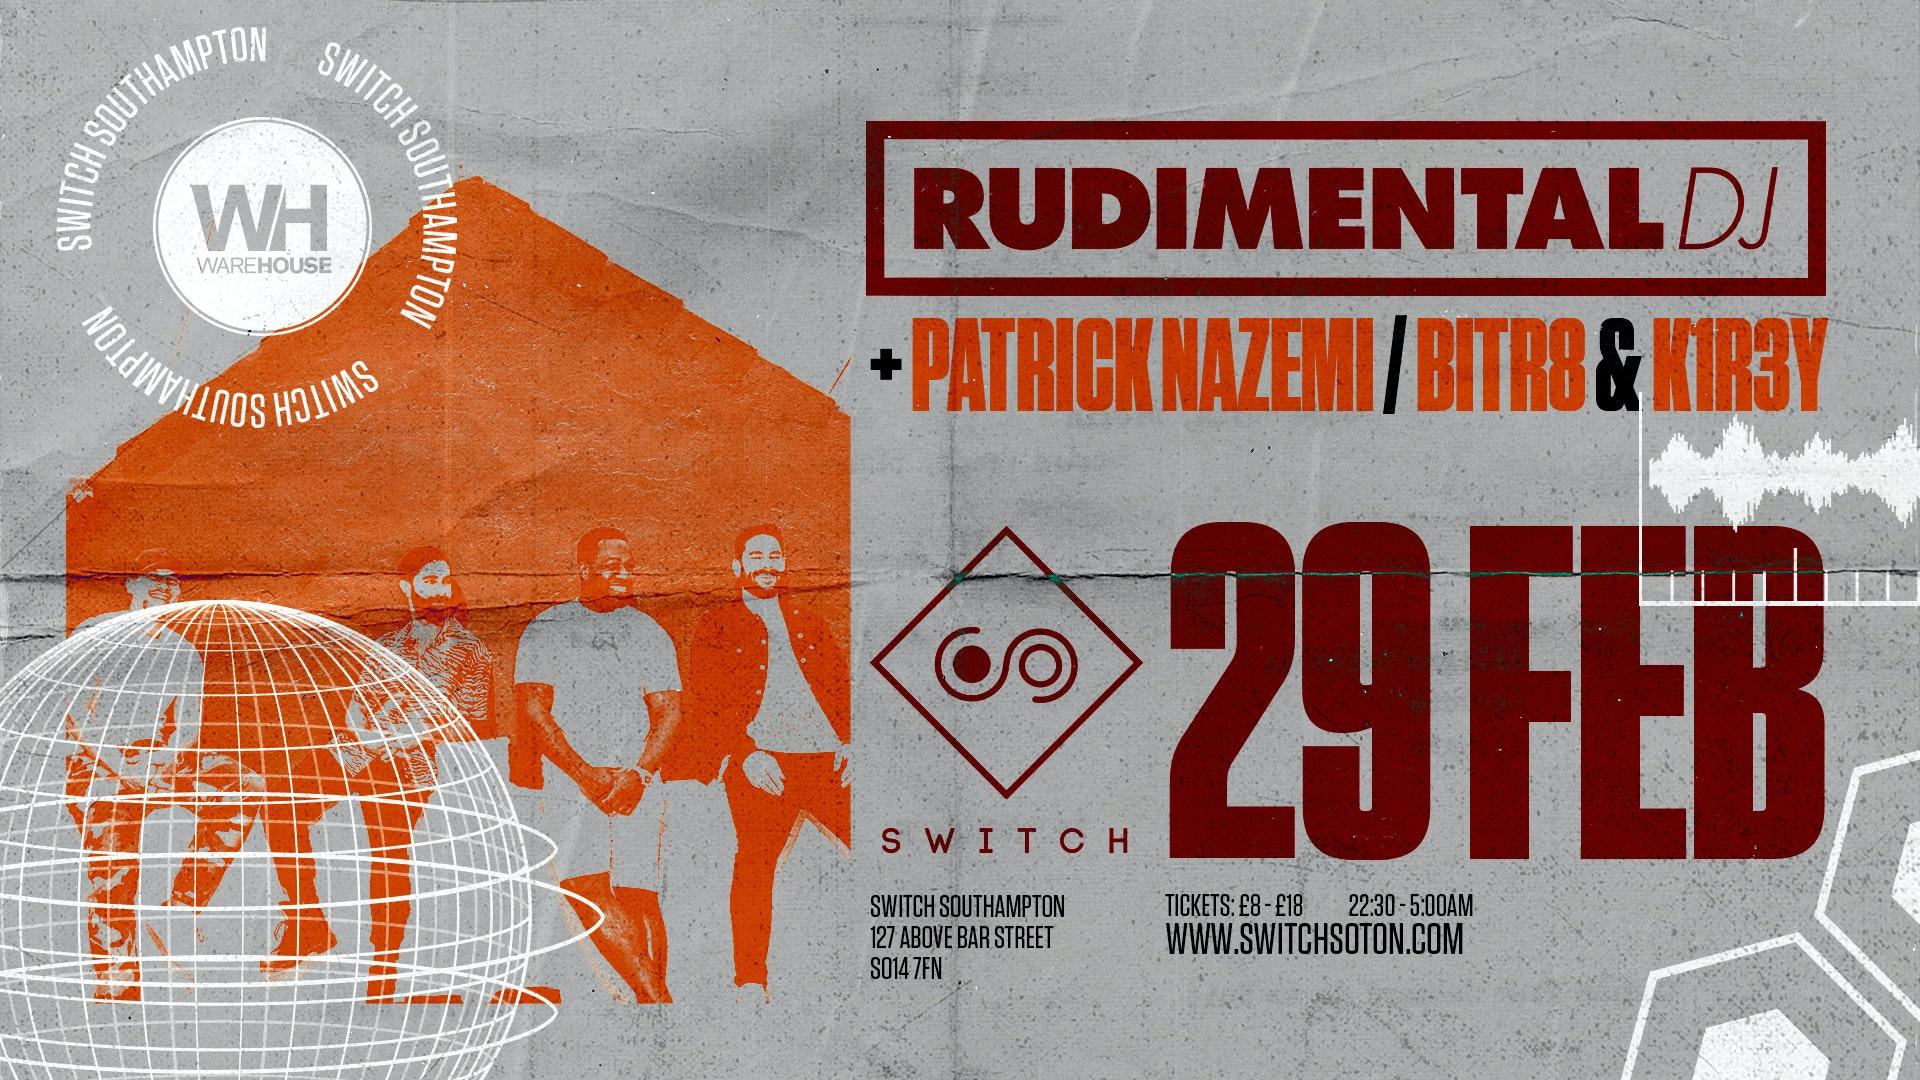 Warehouse Presents: Rudimental DJ